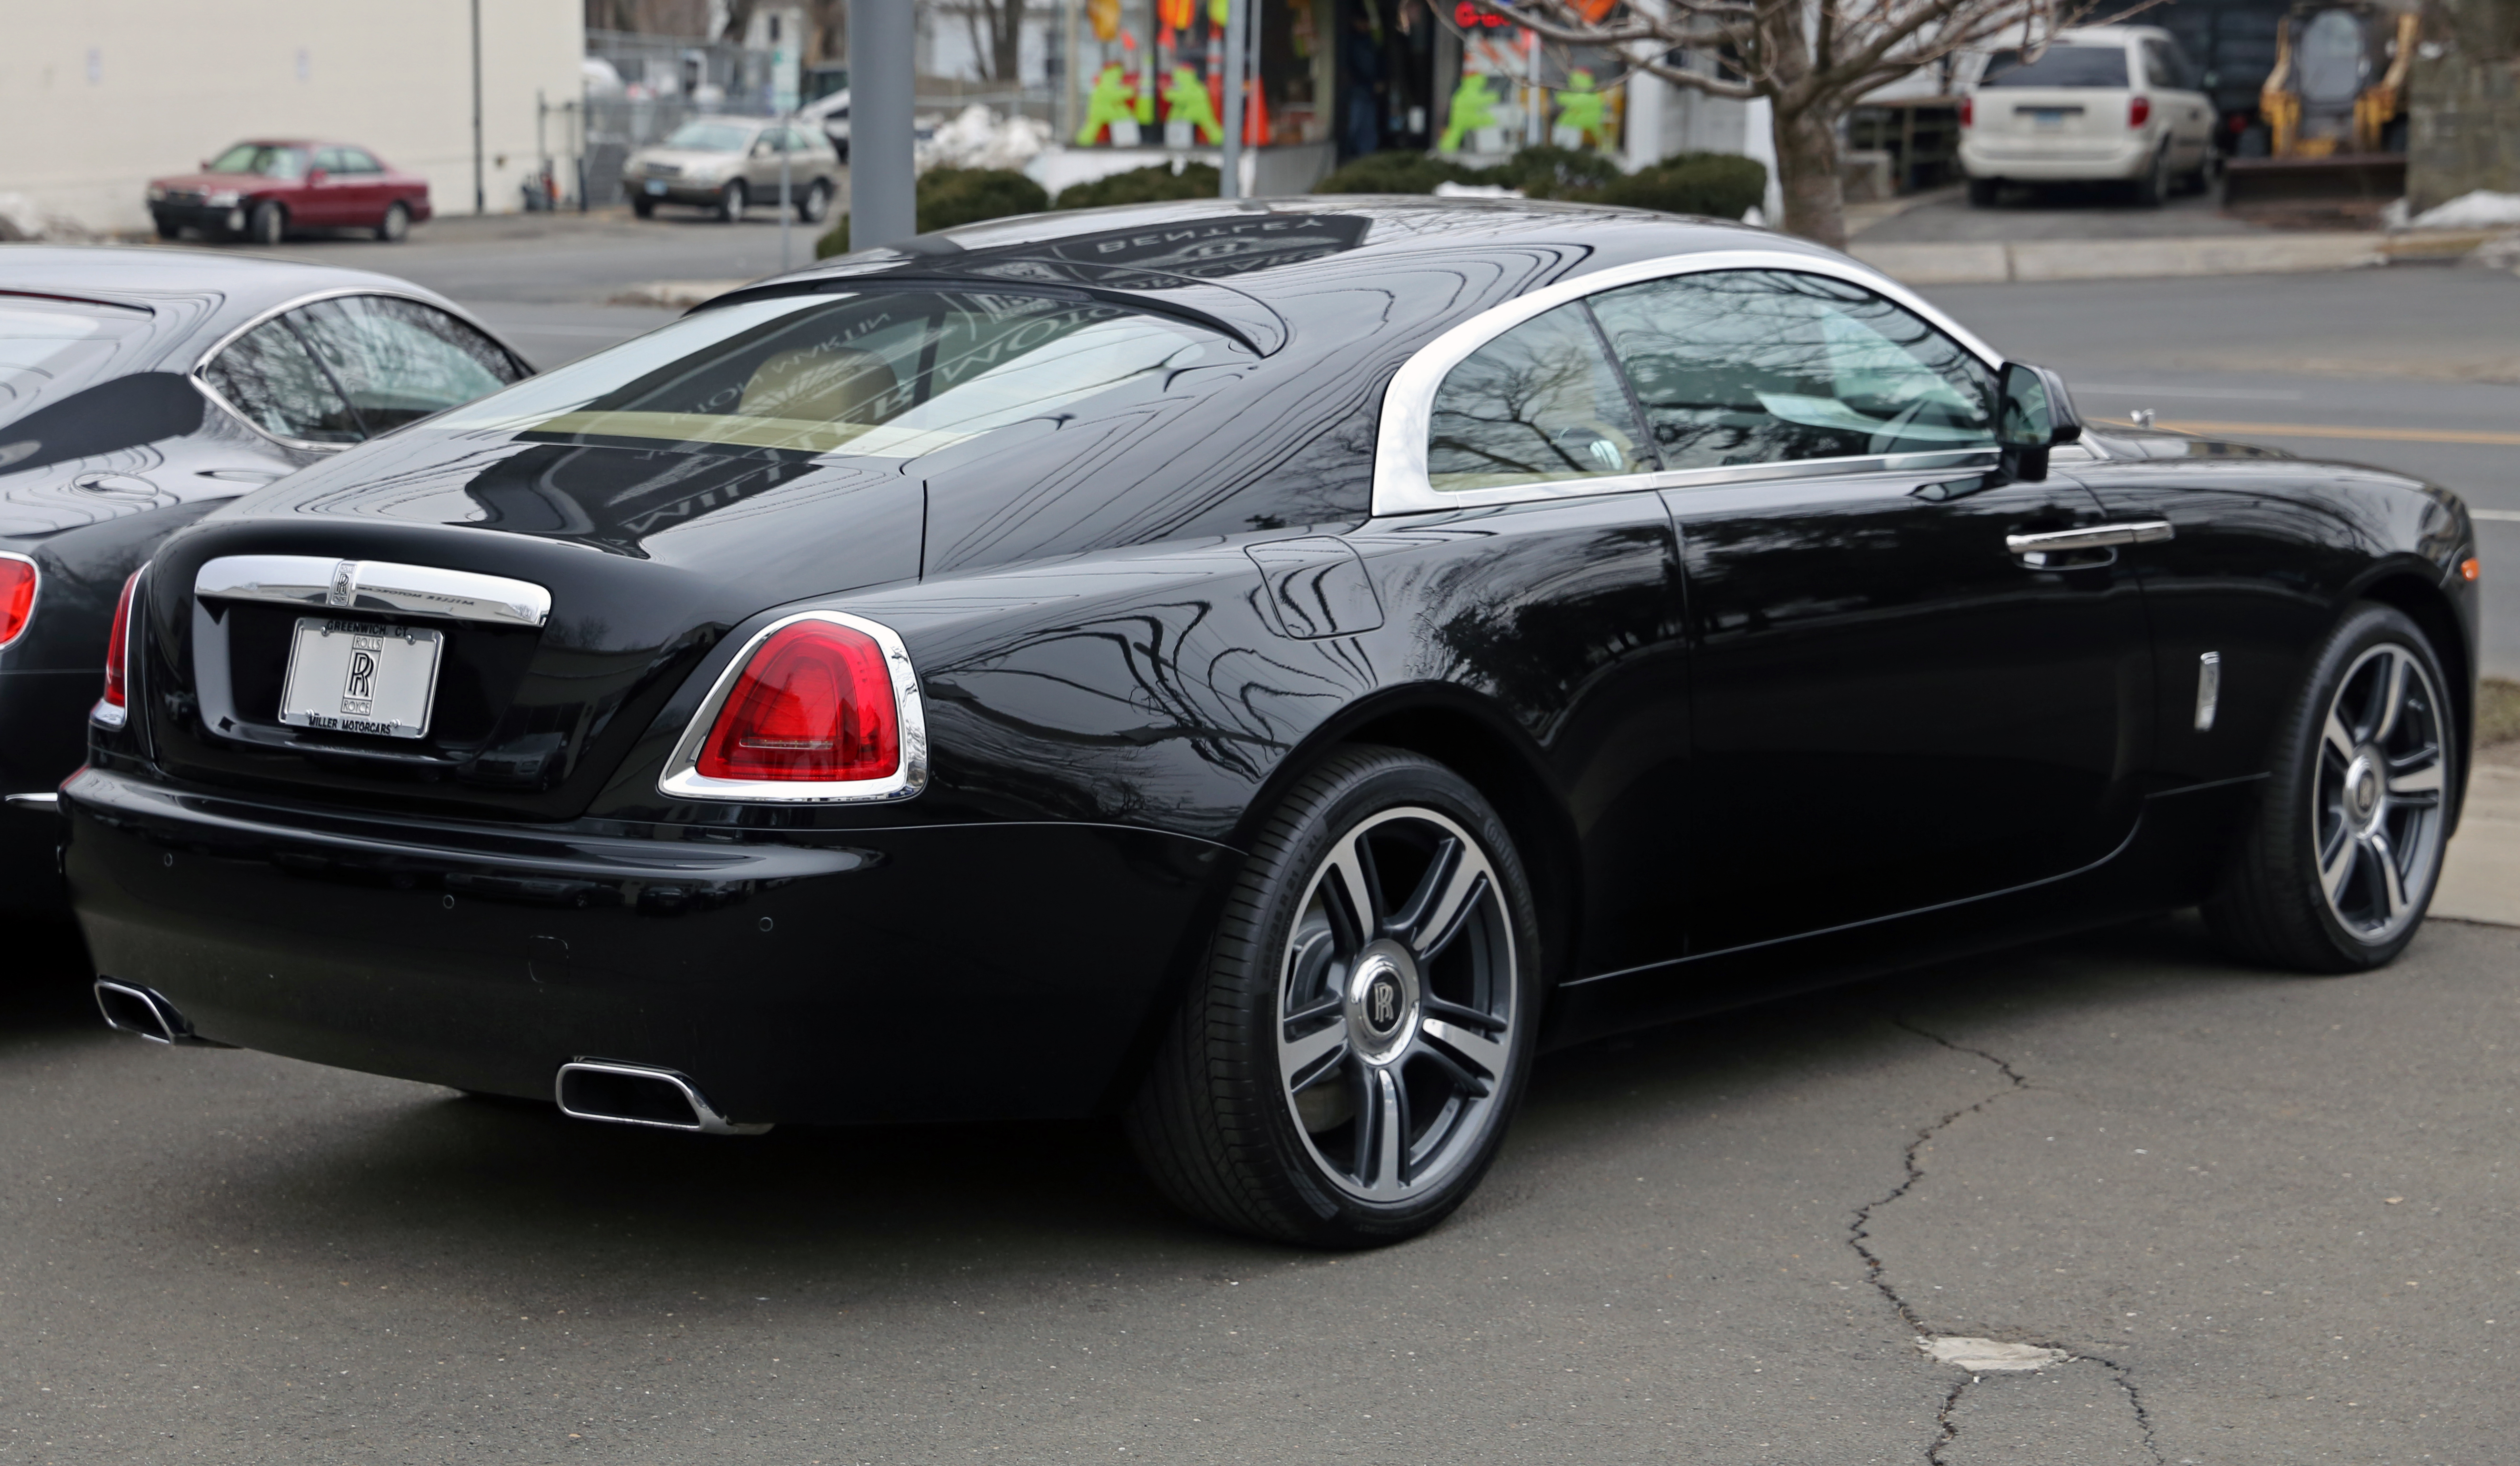 Rolls Royce Wraith Wikipedia Rolls-royce Wraith